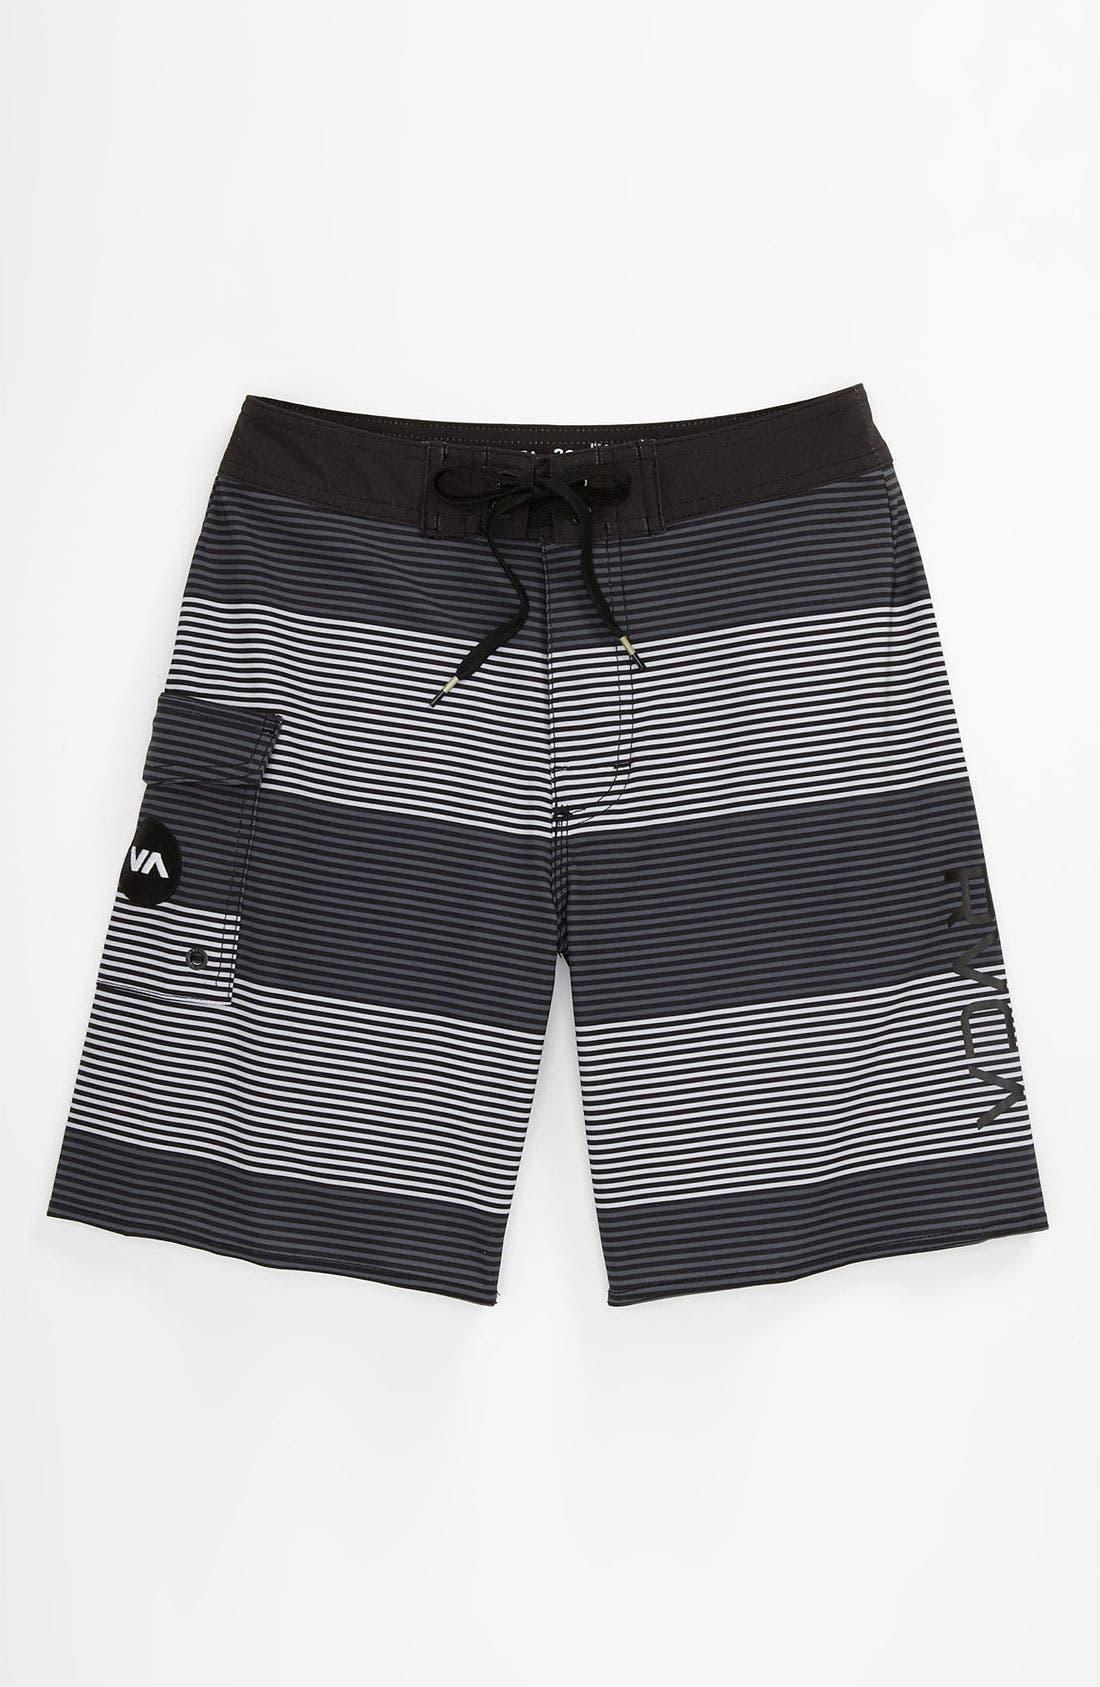 Alternate Image 1 Selected - RVCA 'Civil Stripe' Board Shorts (Big Boys)